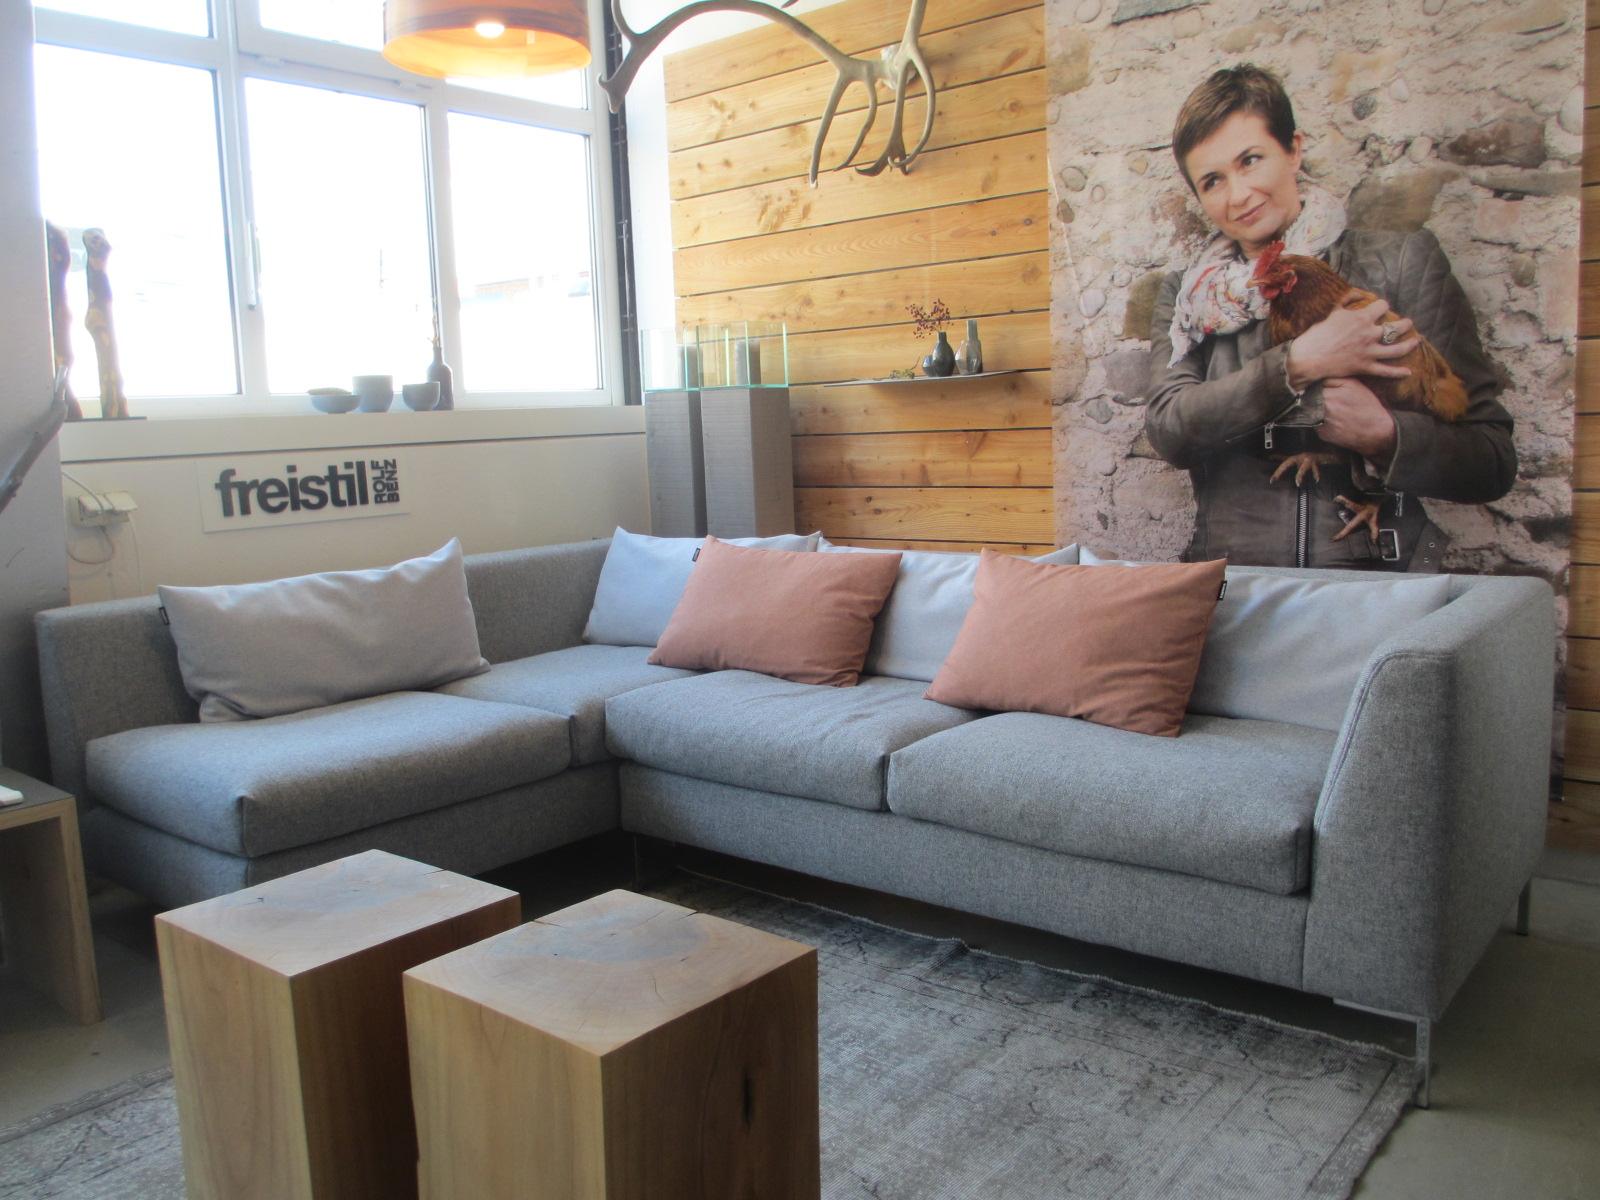 aktueller abverkauf freistil rolf benz ausstellungsm bel. Black Bedroom Furniture Sets. Home Design Ideas